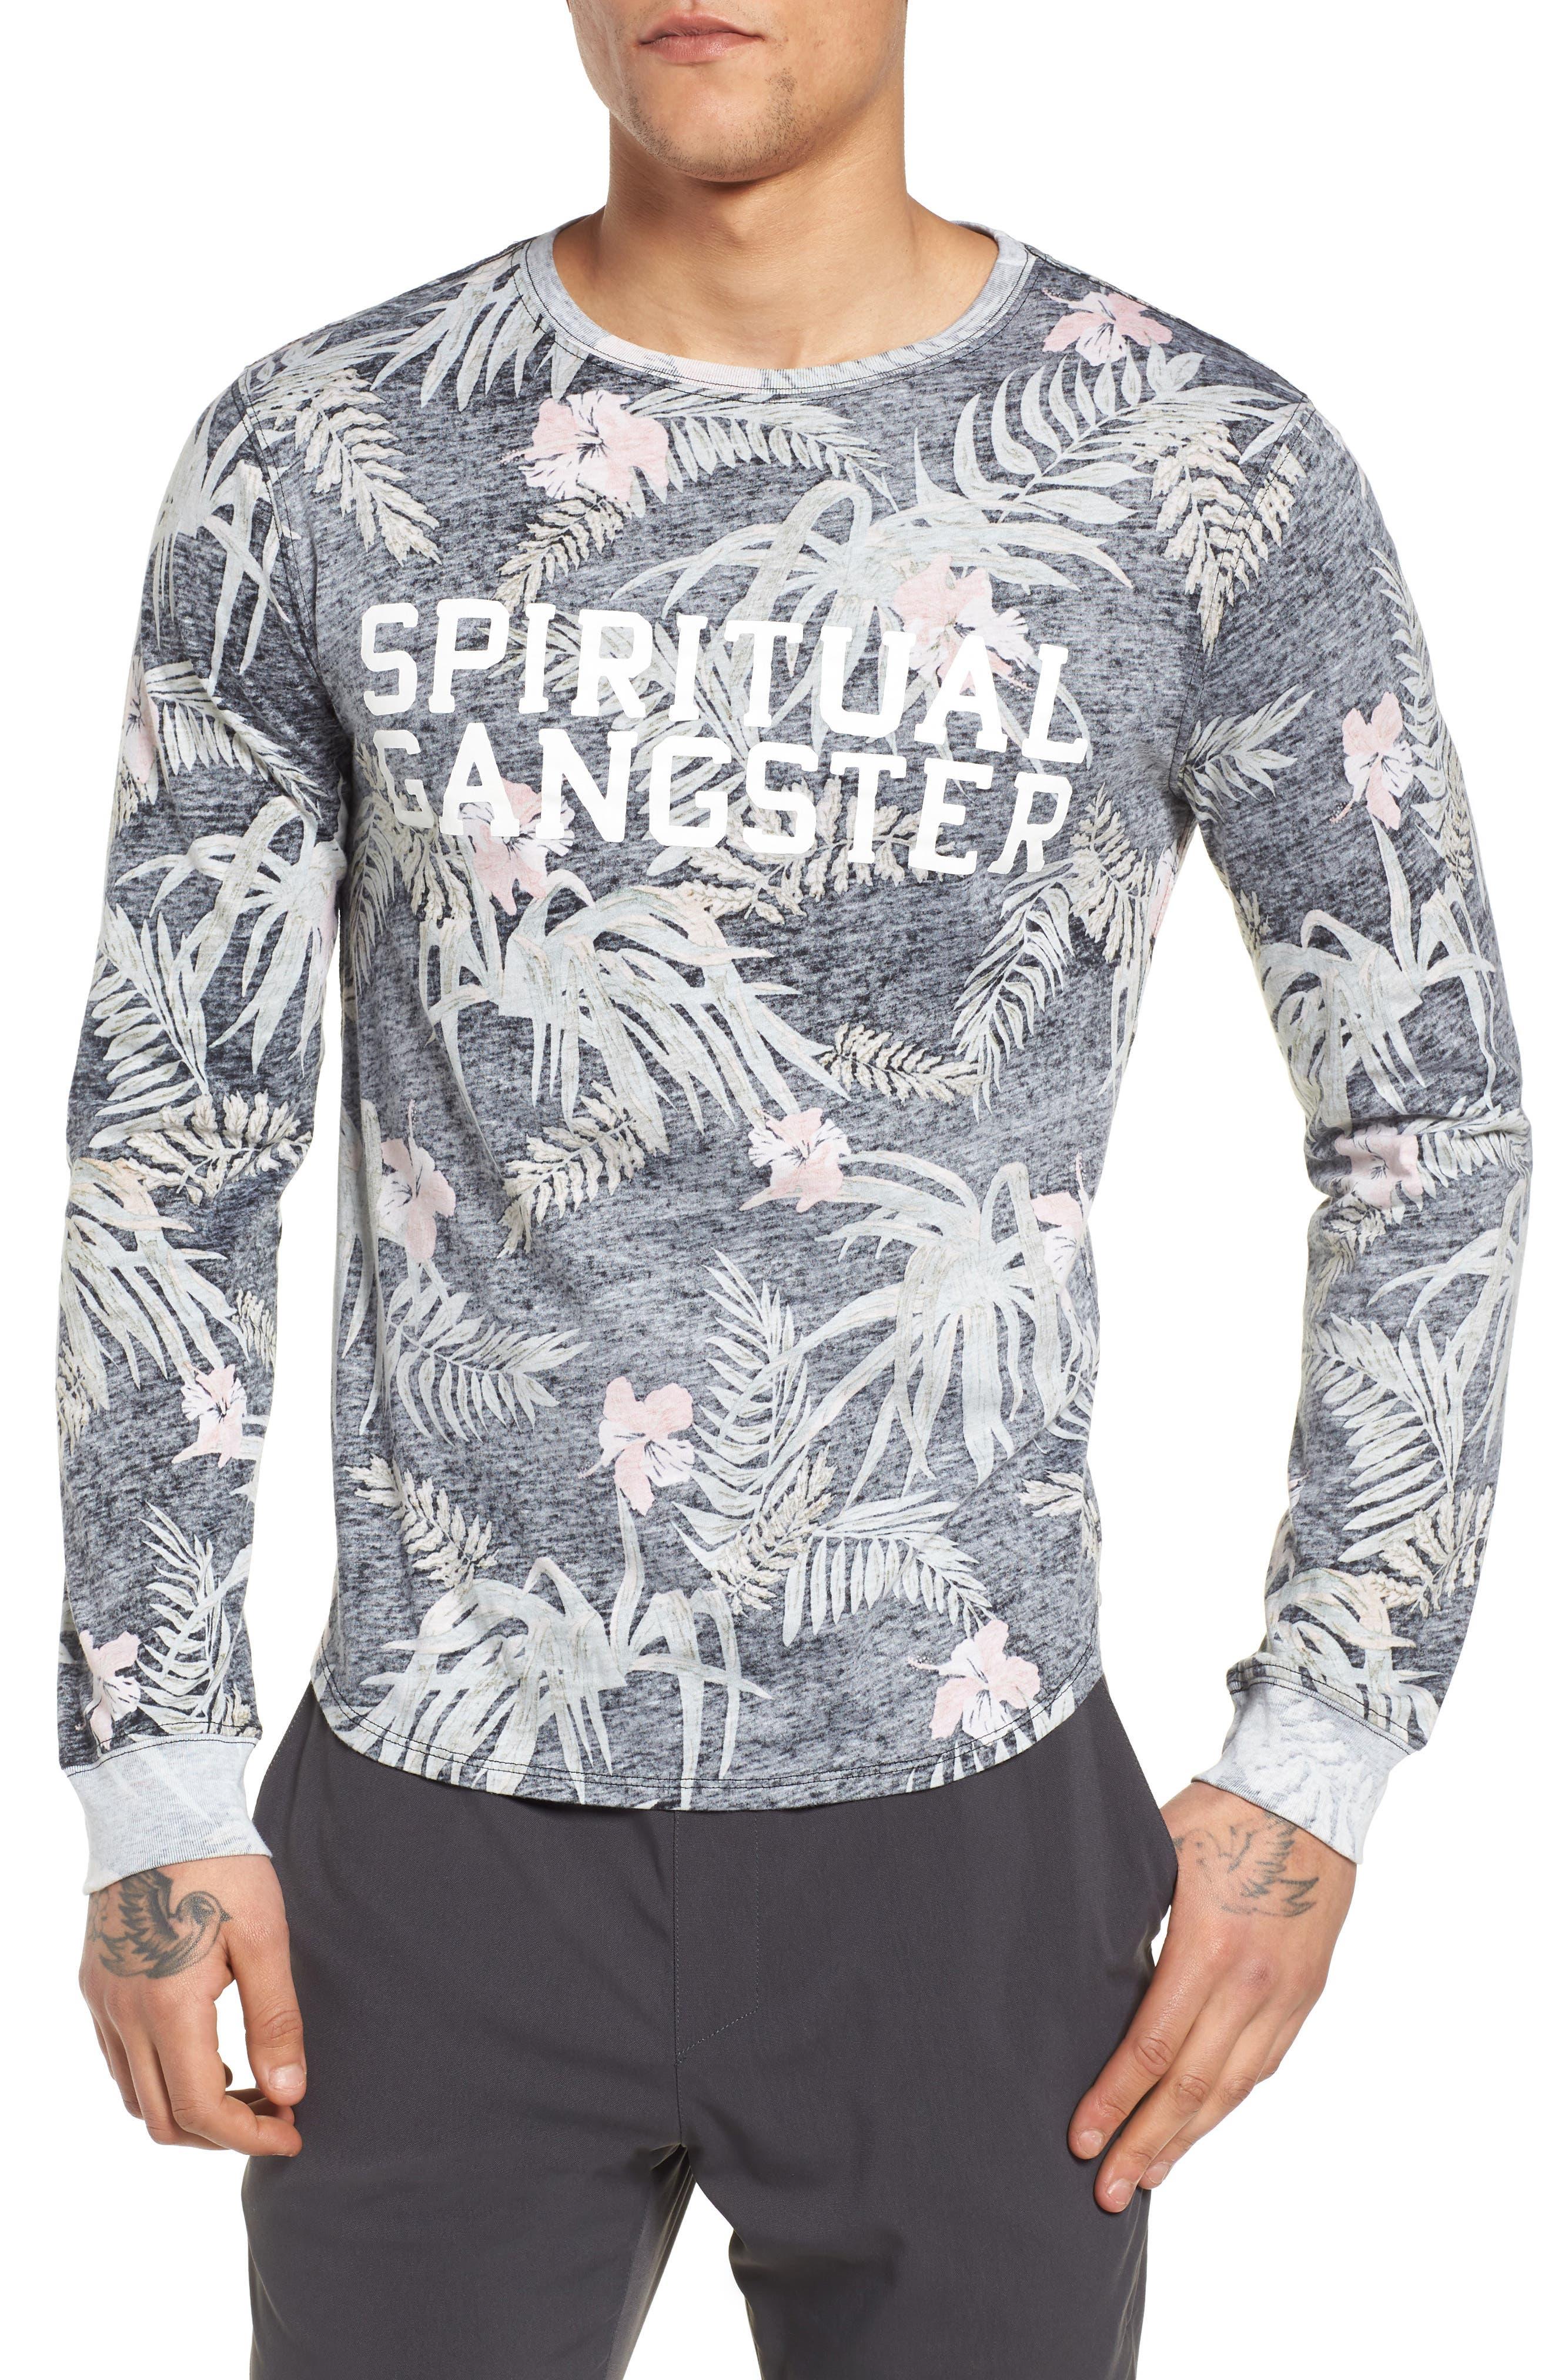 Spiritual Gangster Print T-Shirt